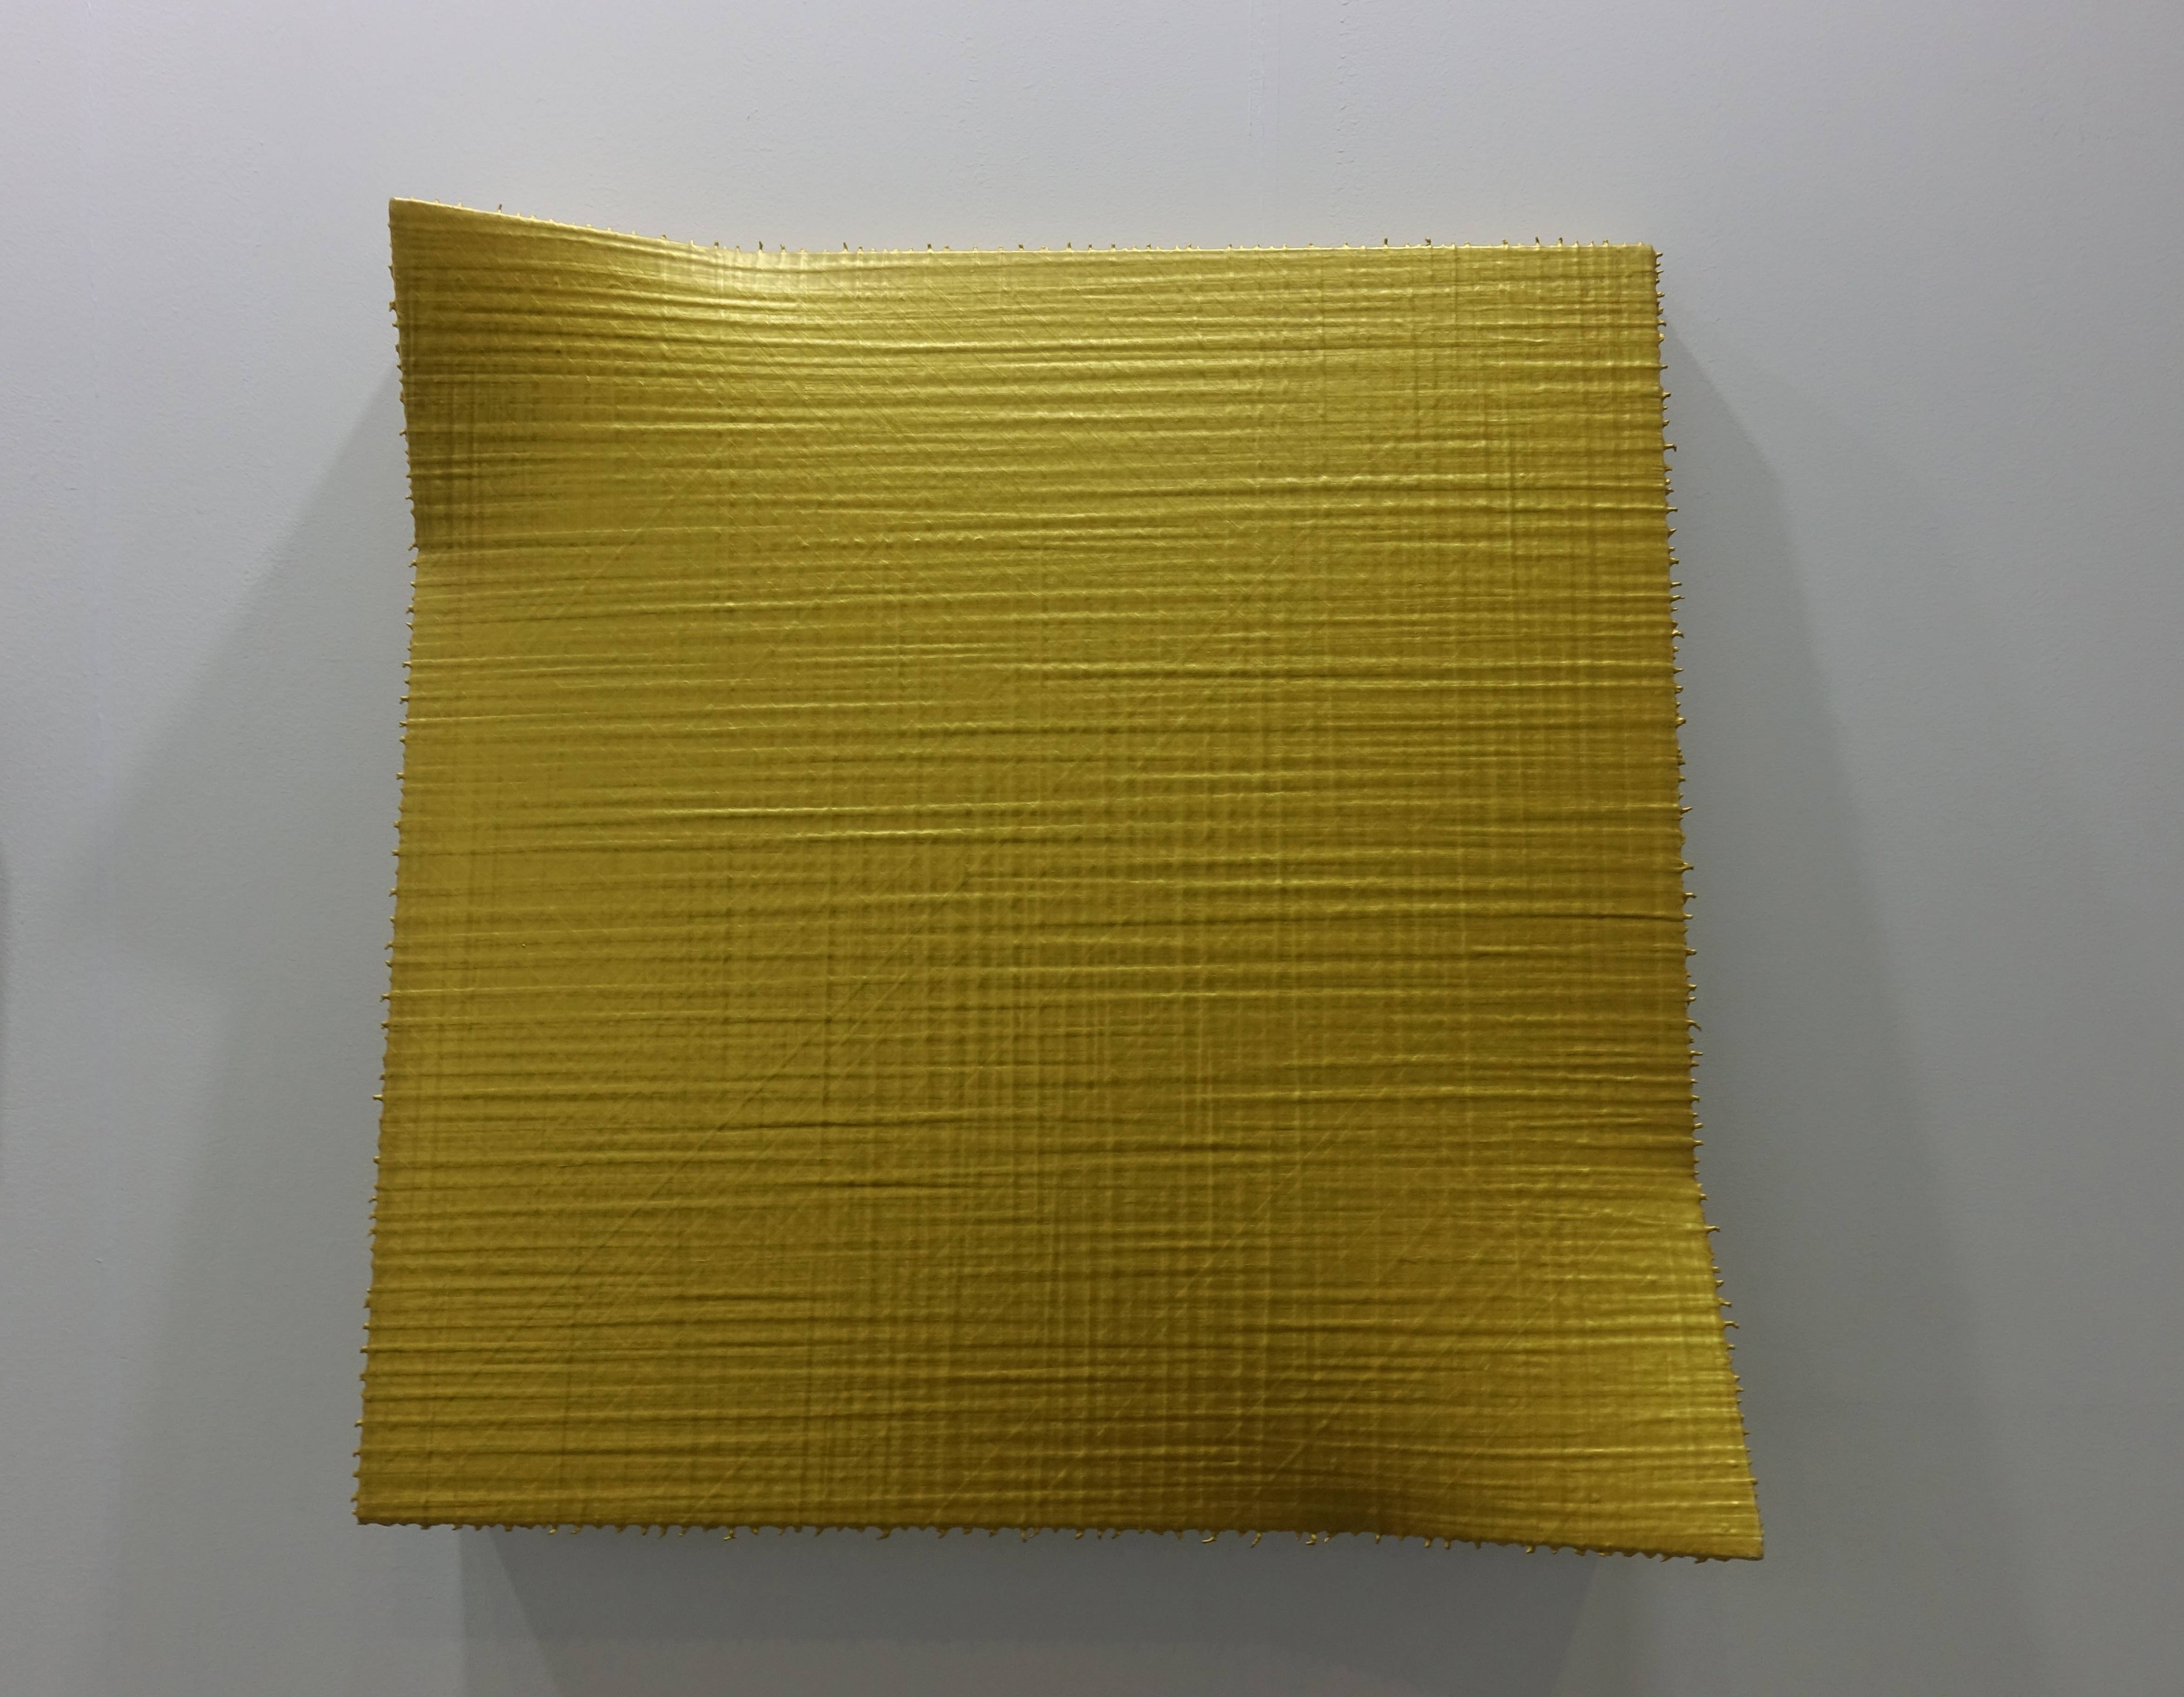 A01亞洲當代藝術空間展出作品。